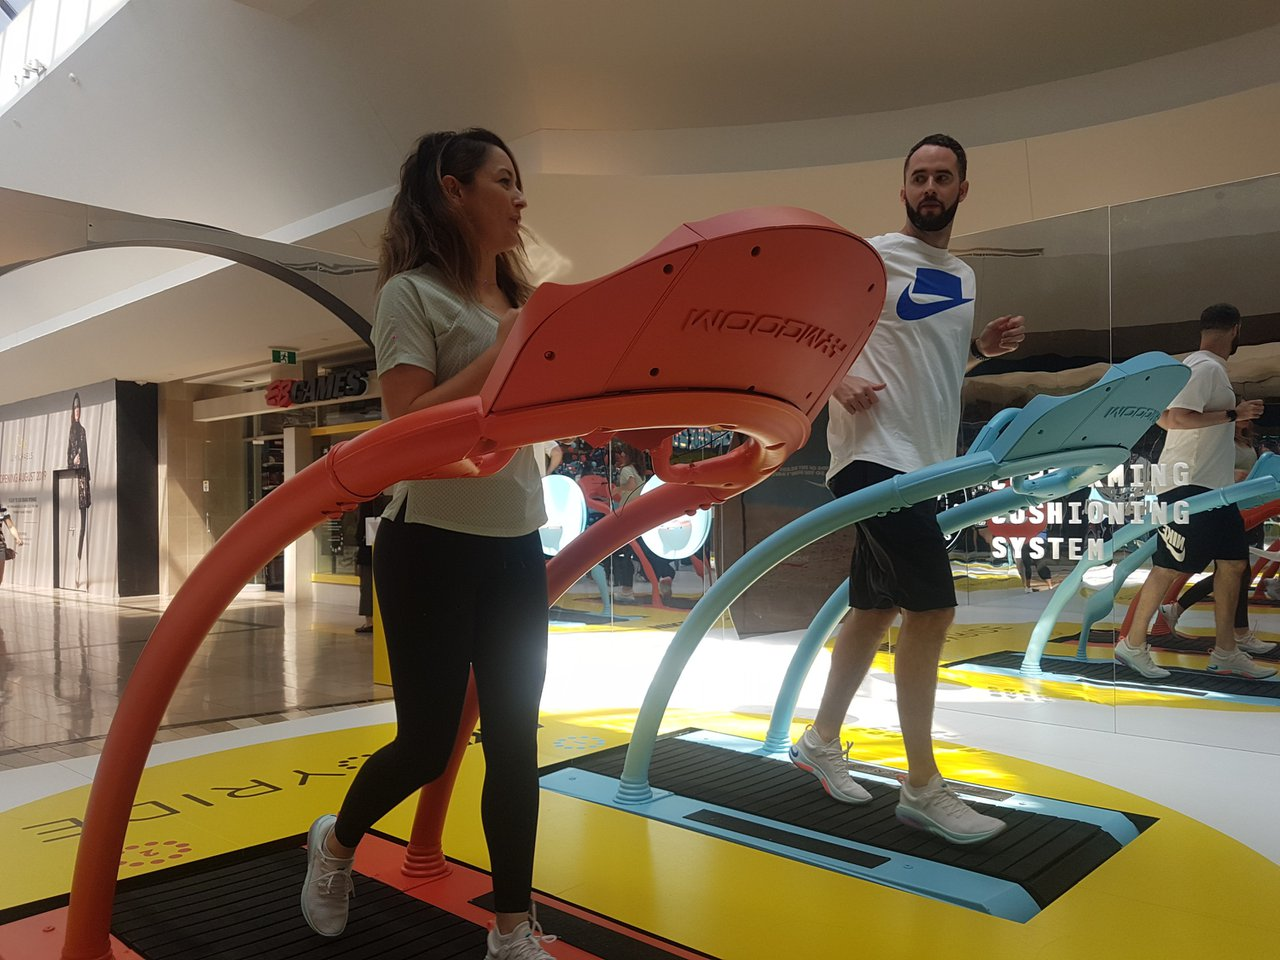 Nike Treadmill photo 20190815_115305.jpg